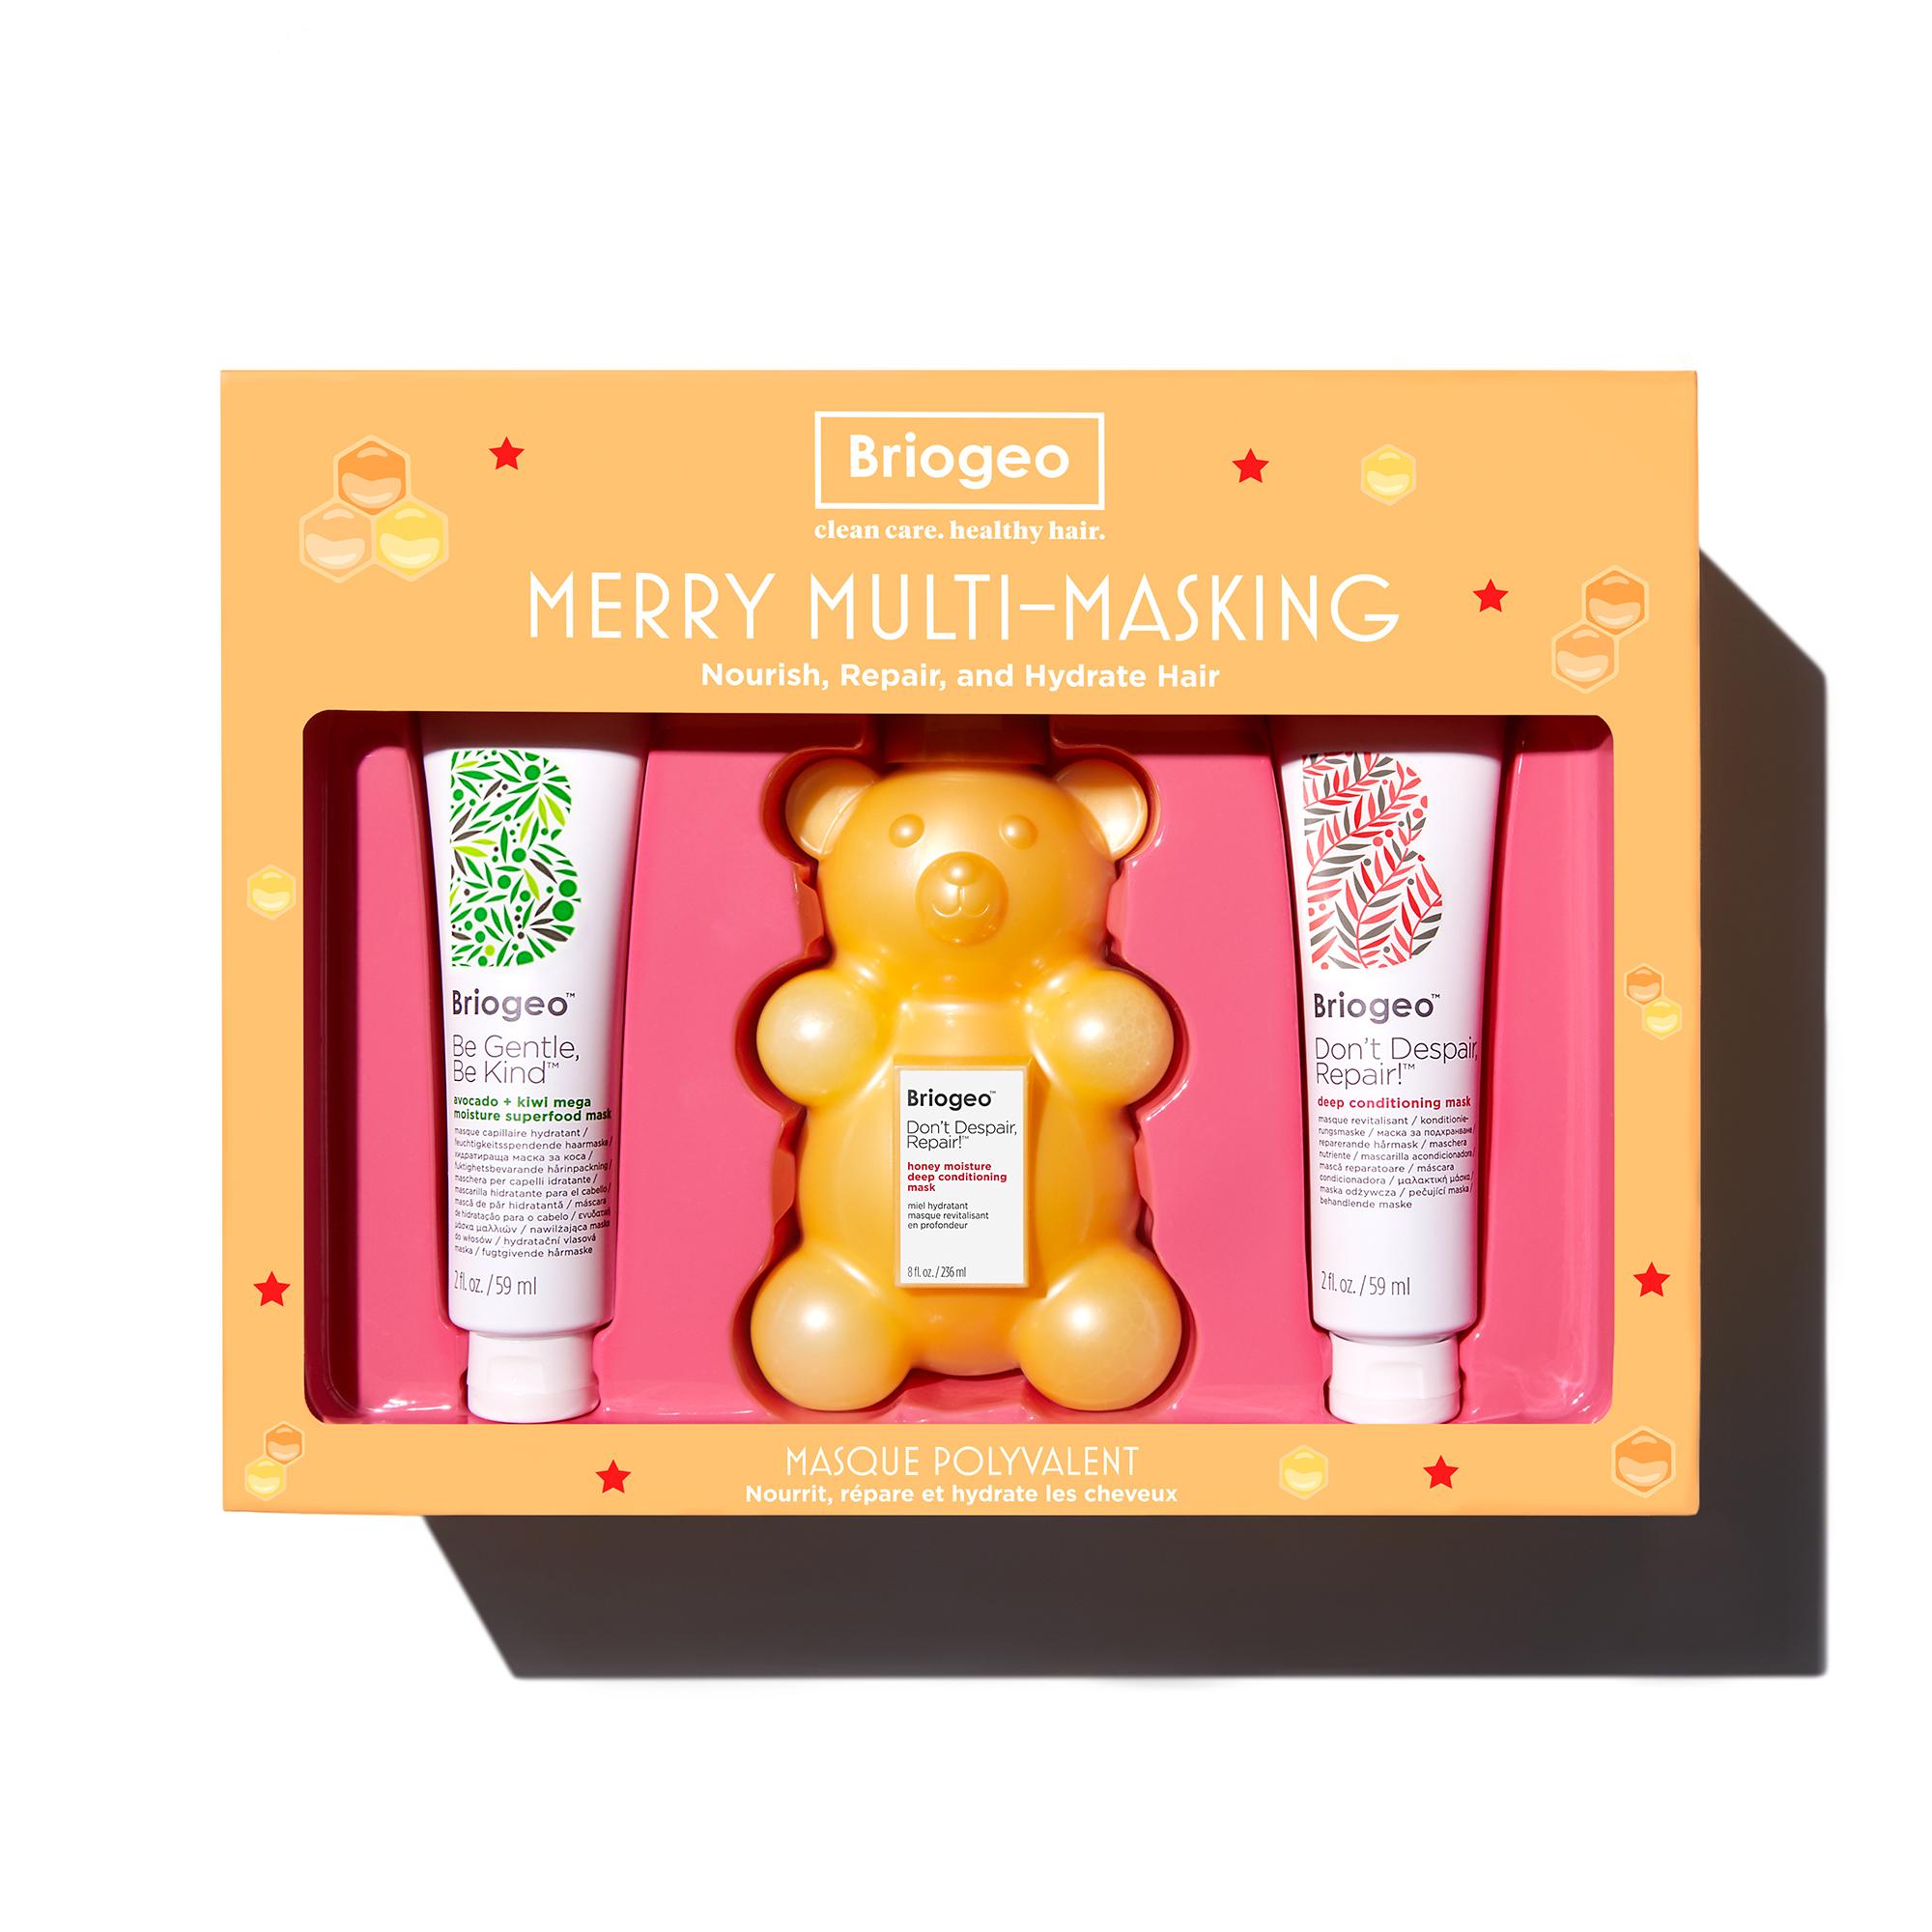 Sephora Gift Image